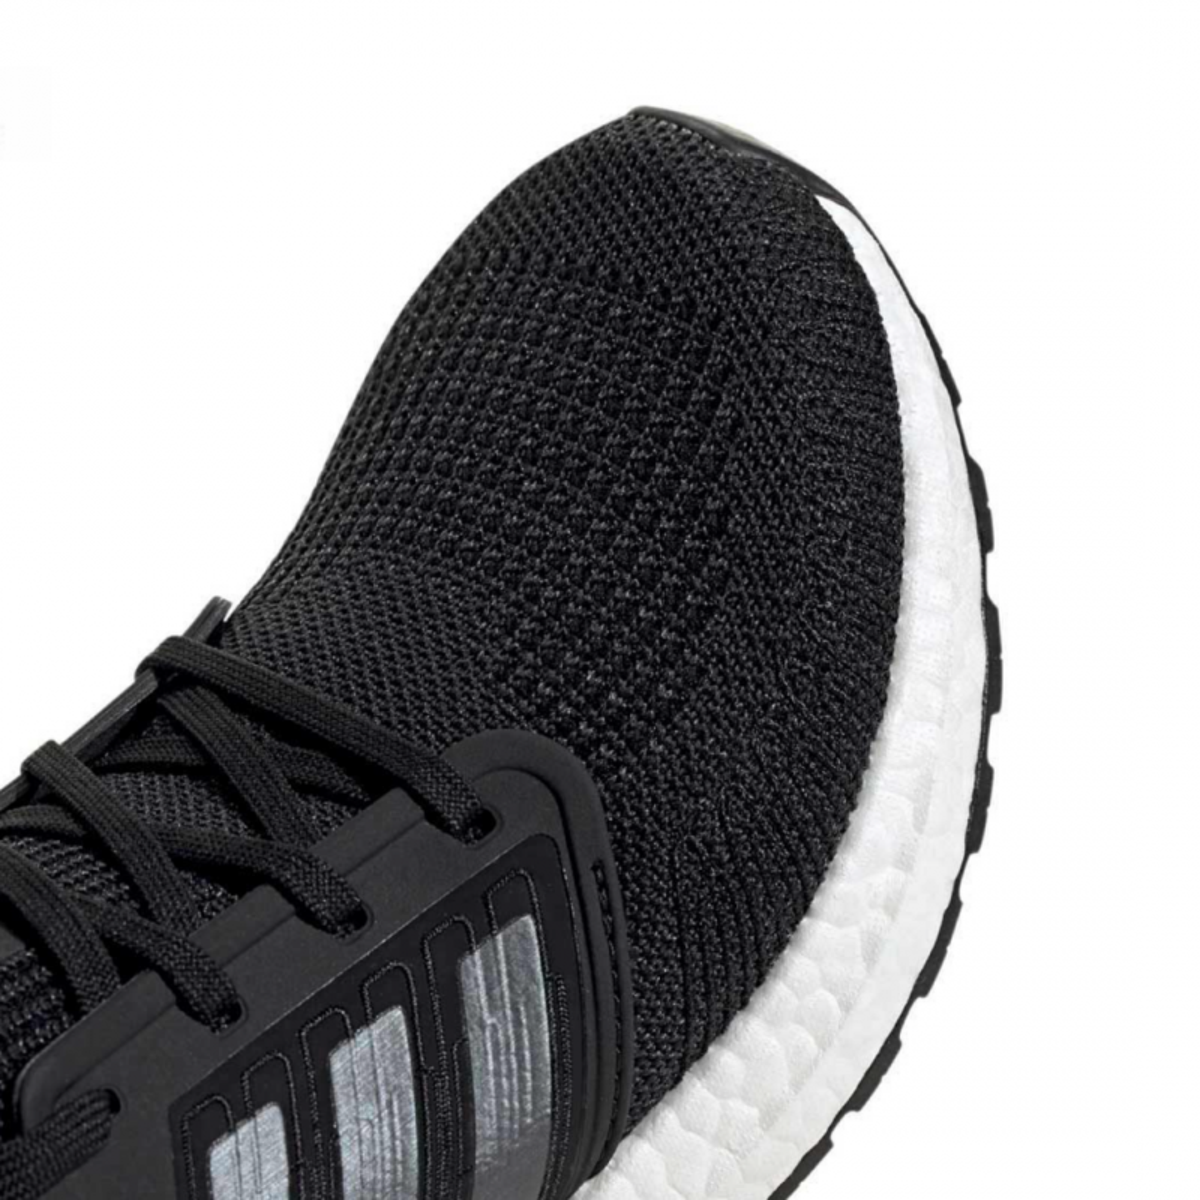 Zapatillas Adidas Ultra Boost 20 Negro Blanco Mujer PV20